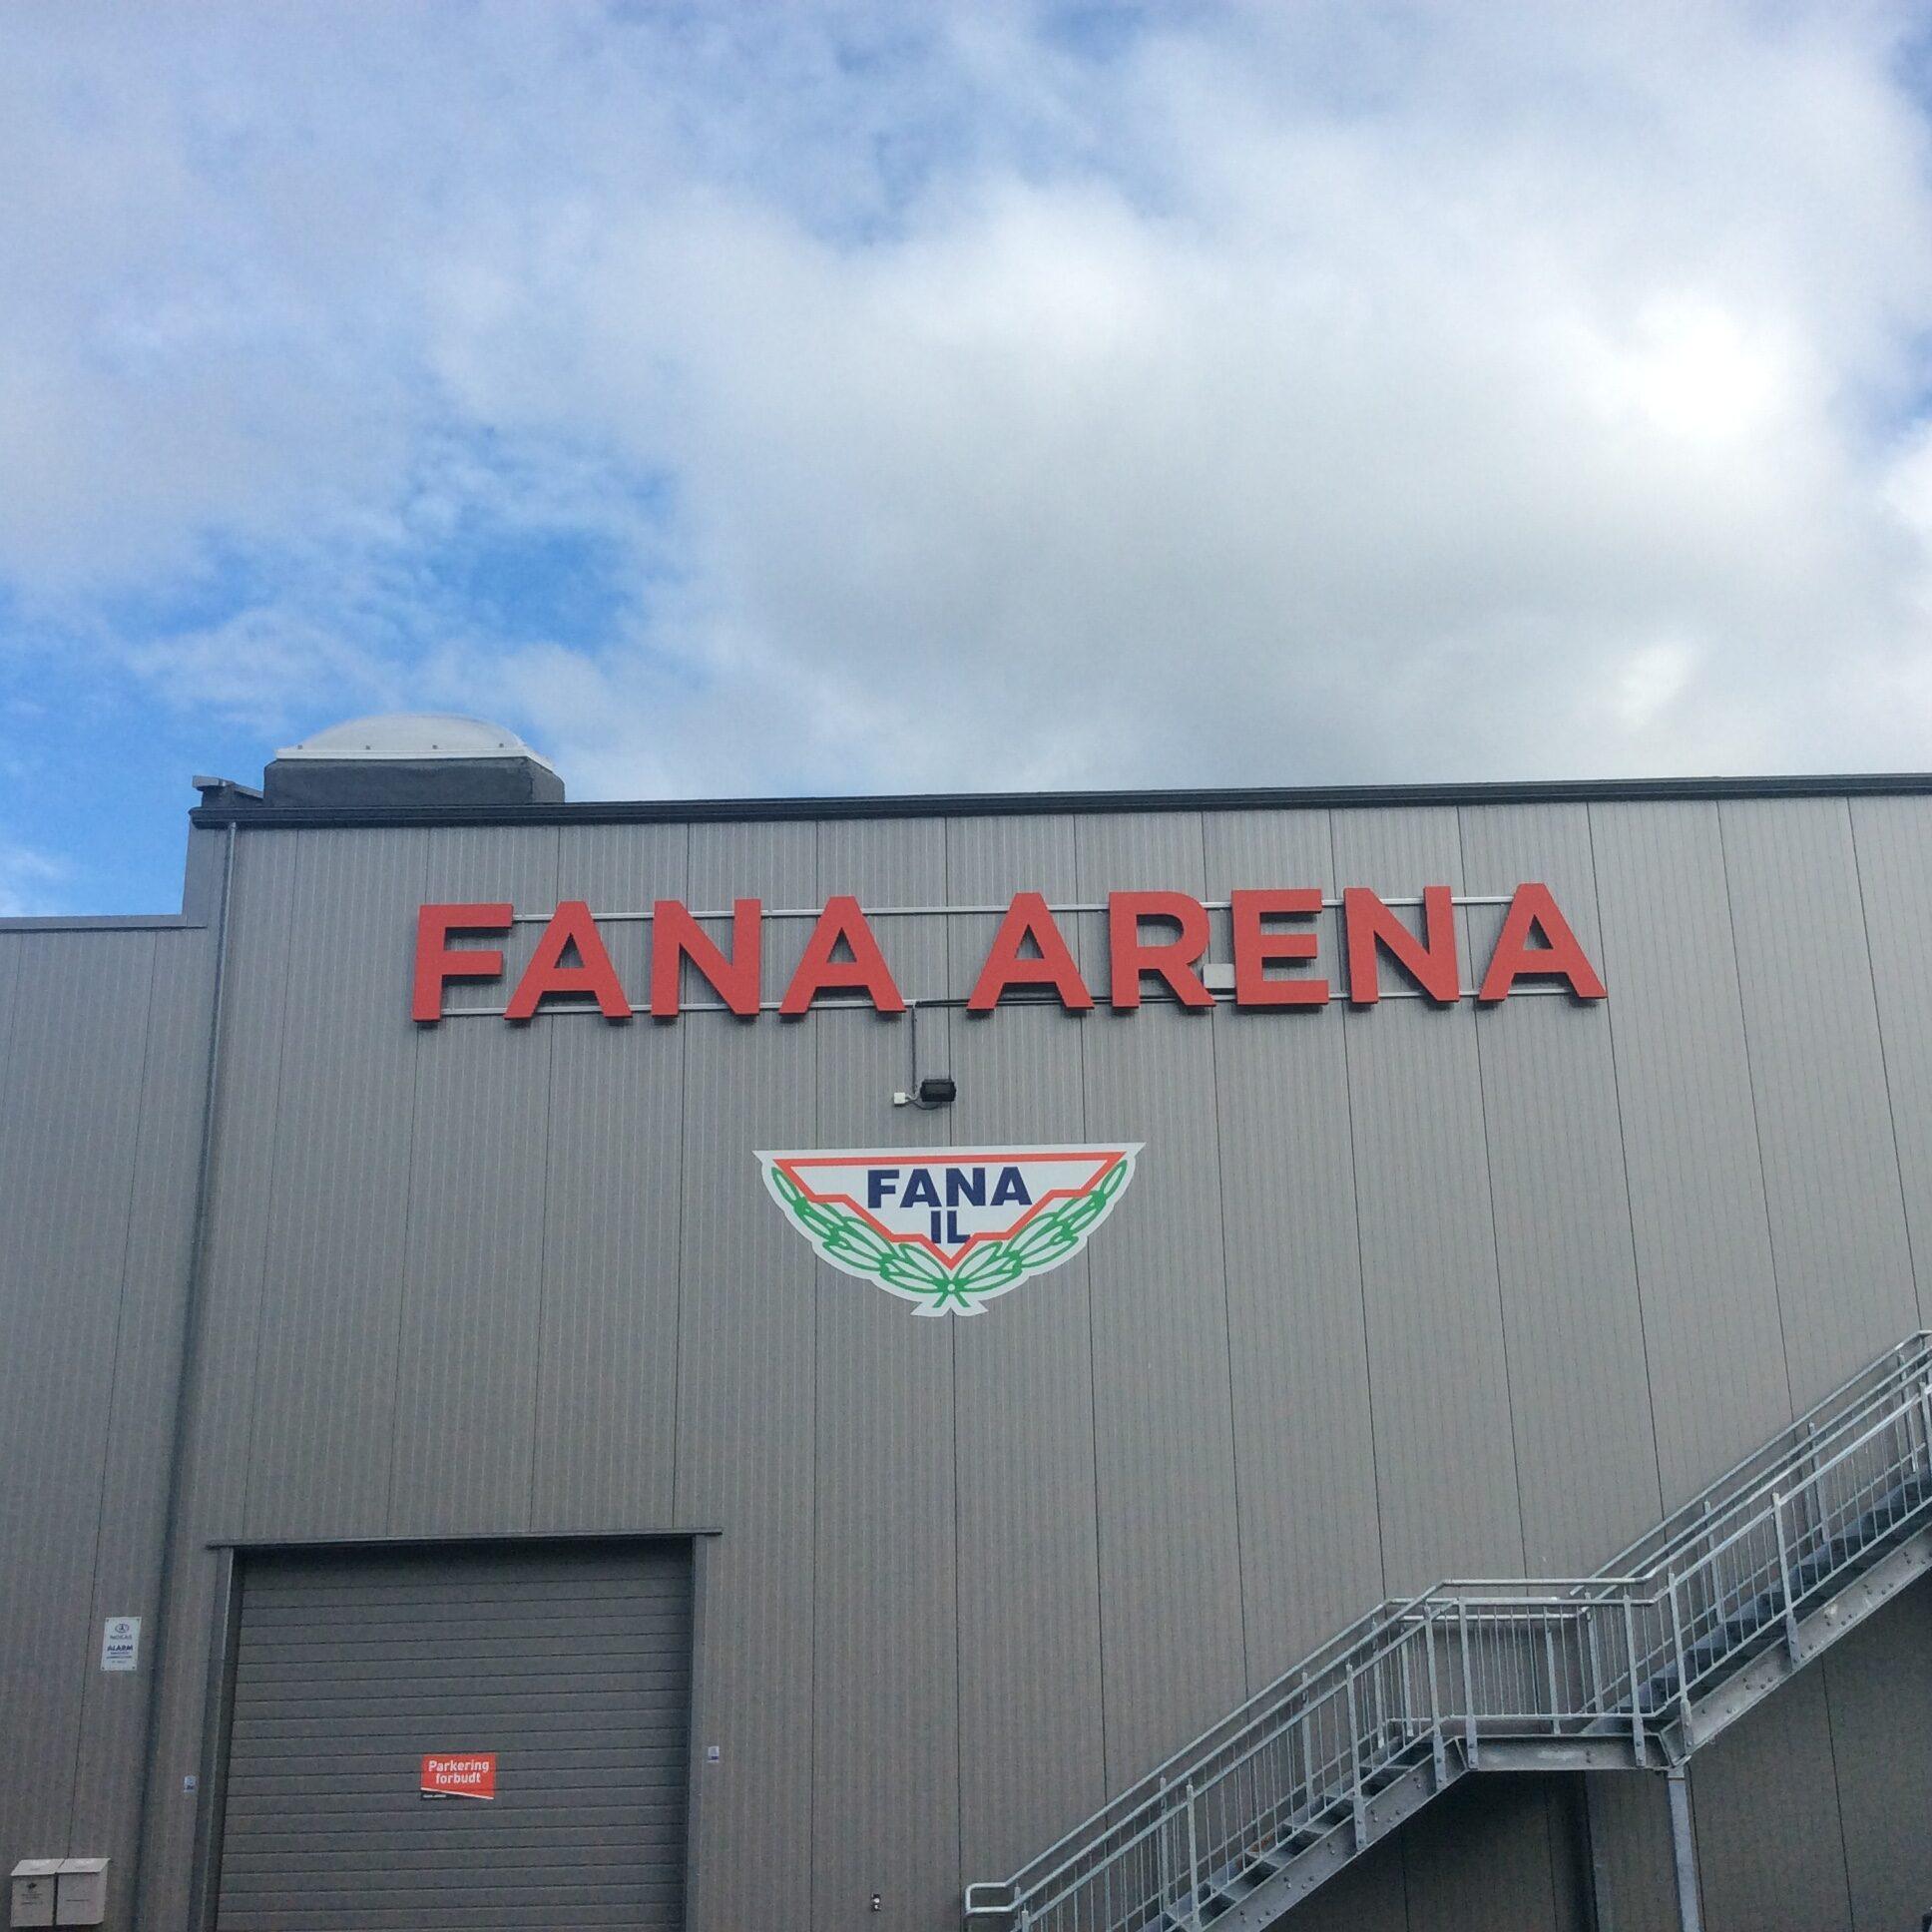 Fana Arena